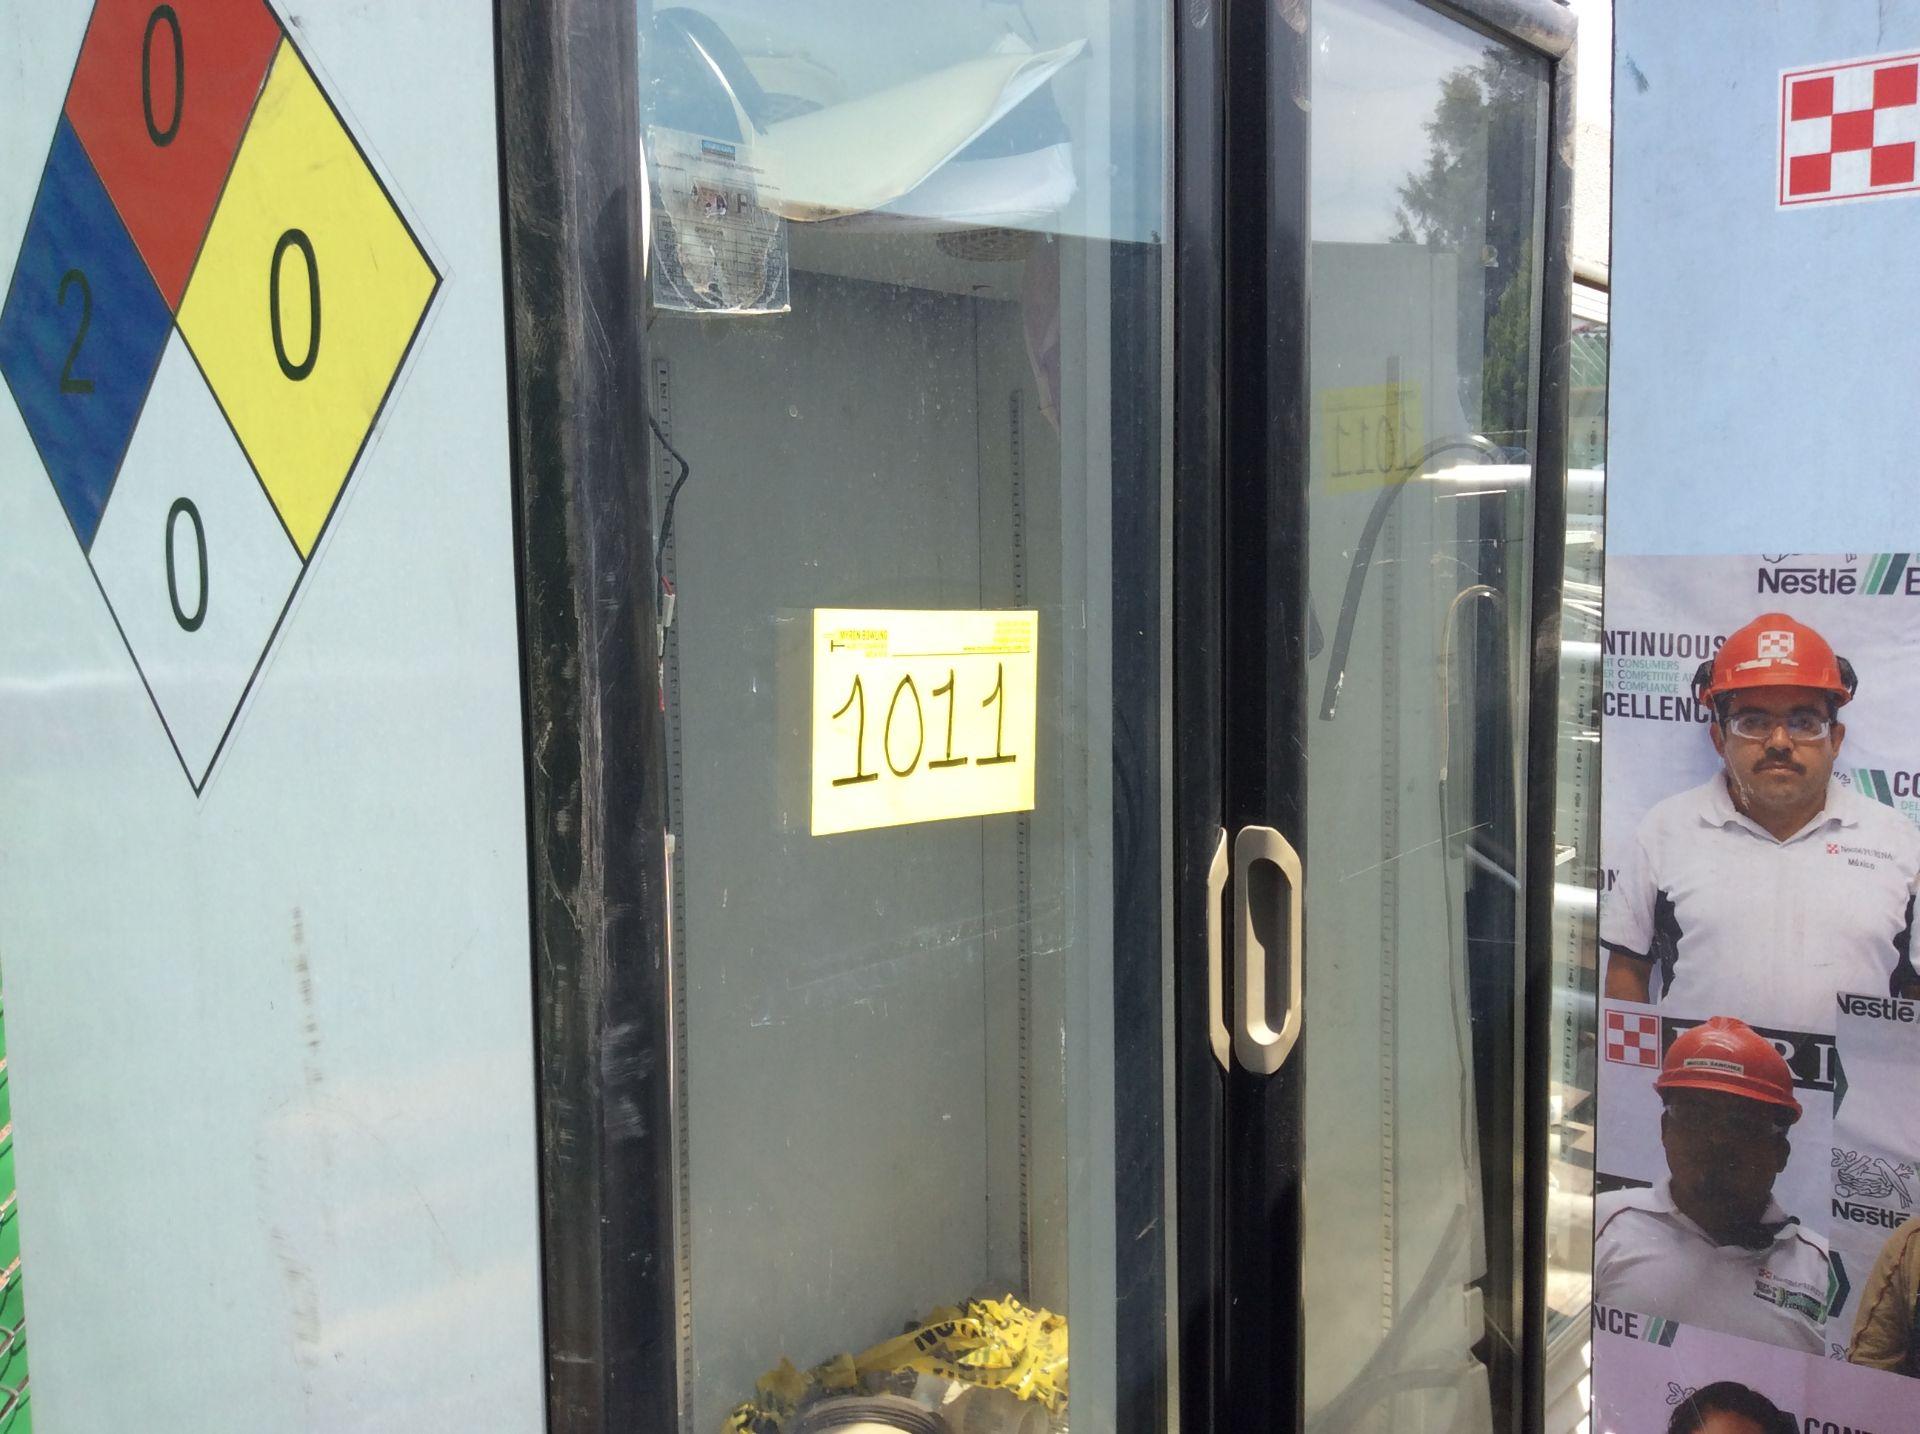 1 Ojeda refrigerator of double glass door model RV2P36 serial number 0636323-34305 120V - Image 4 of 14